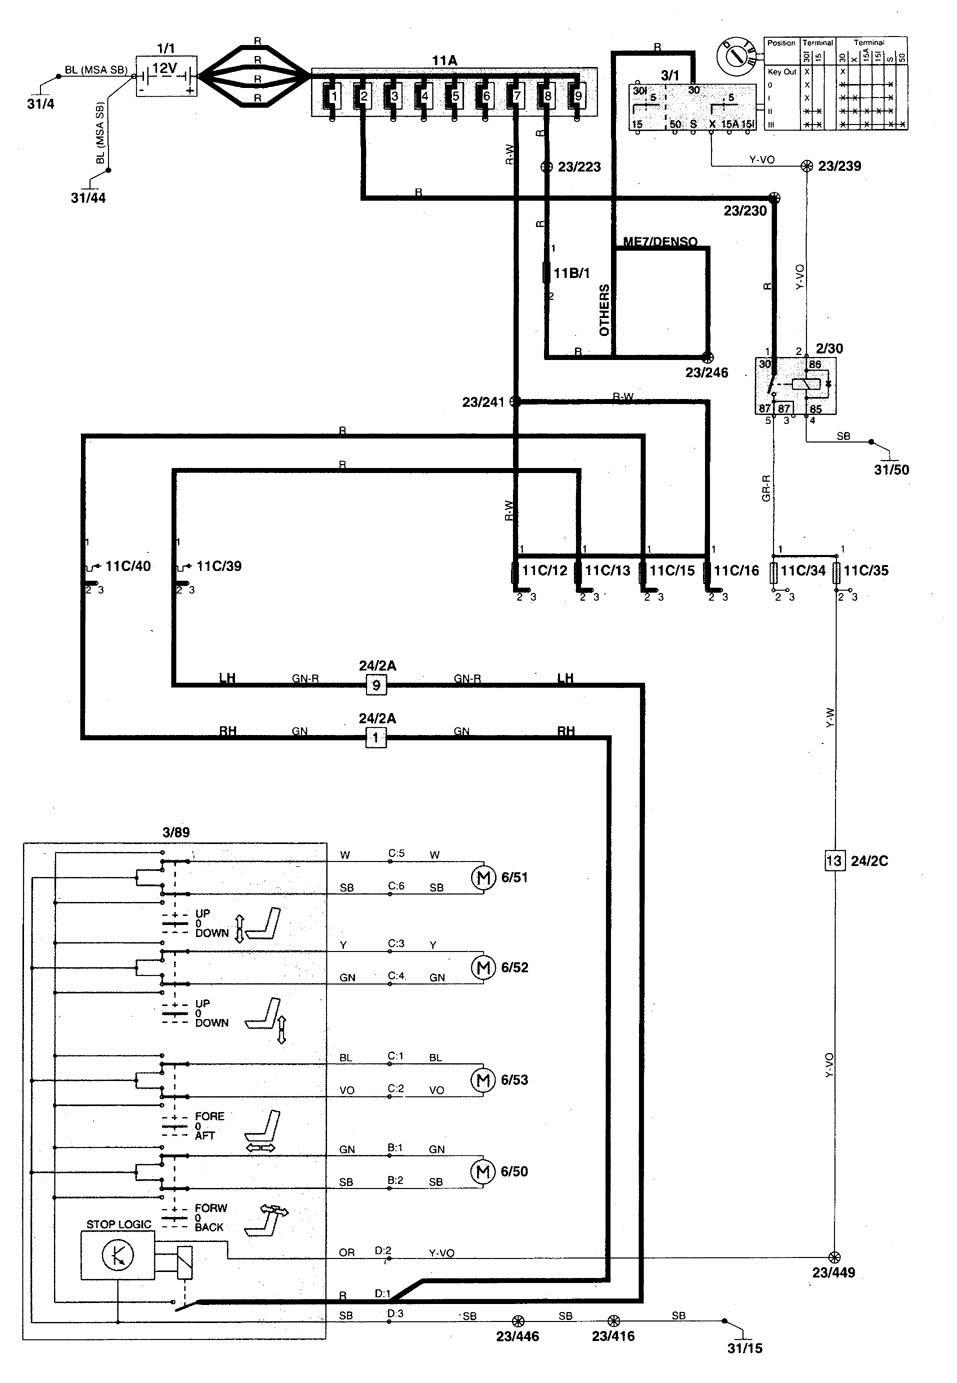 2002 Volvo C70 Seat Wiring Diagram Wiring Diagram Quit Network A Quit Network A Piuconzero It